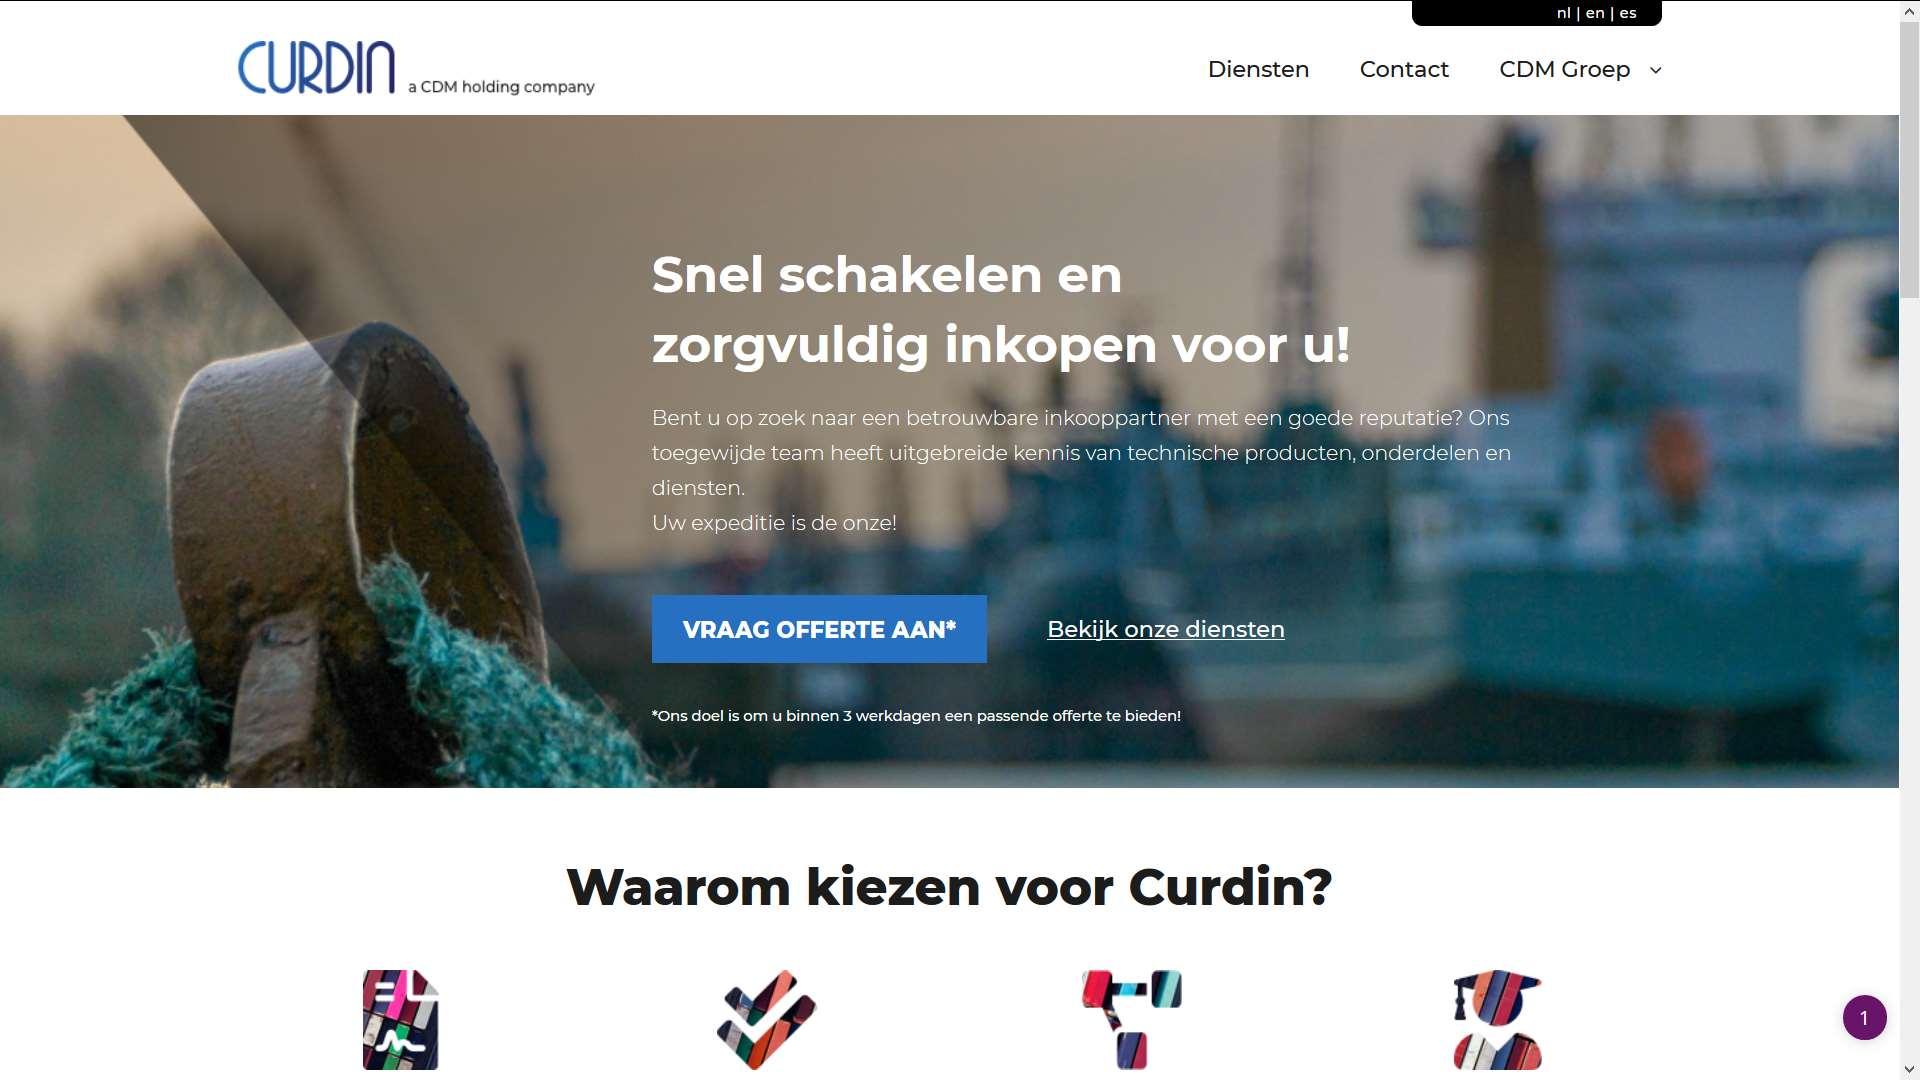 Curdin.nl